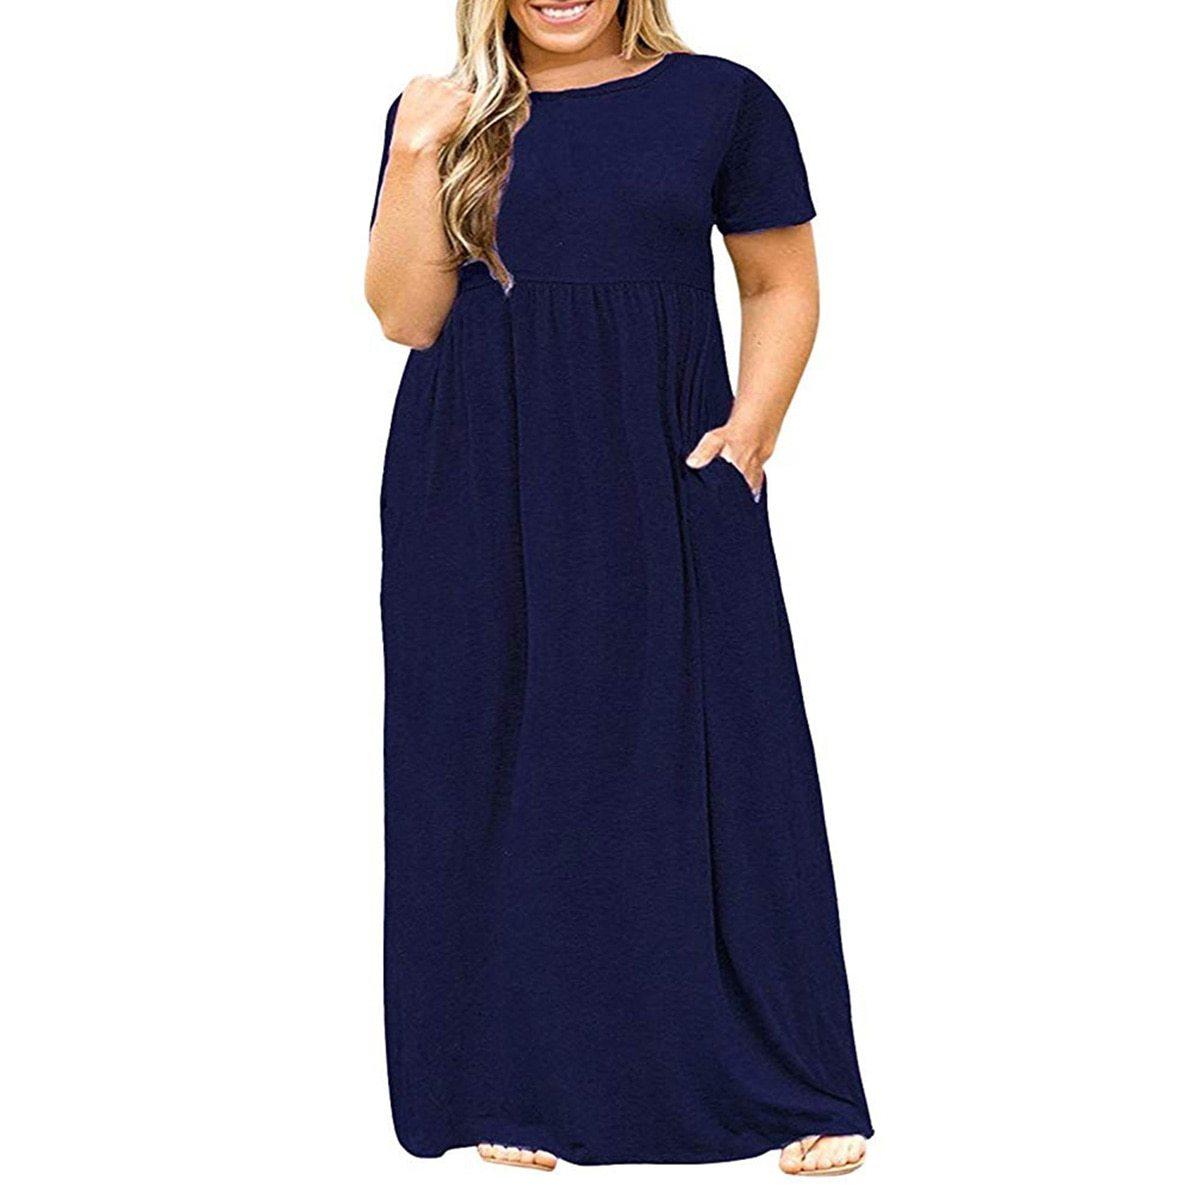 Maternity Dress Solid Color Loose Comfy Mom Dress image 2